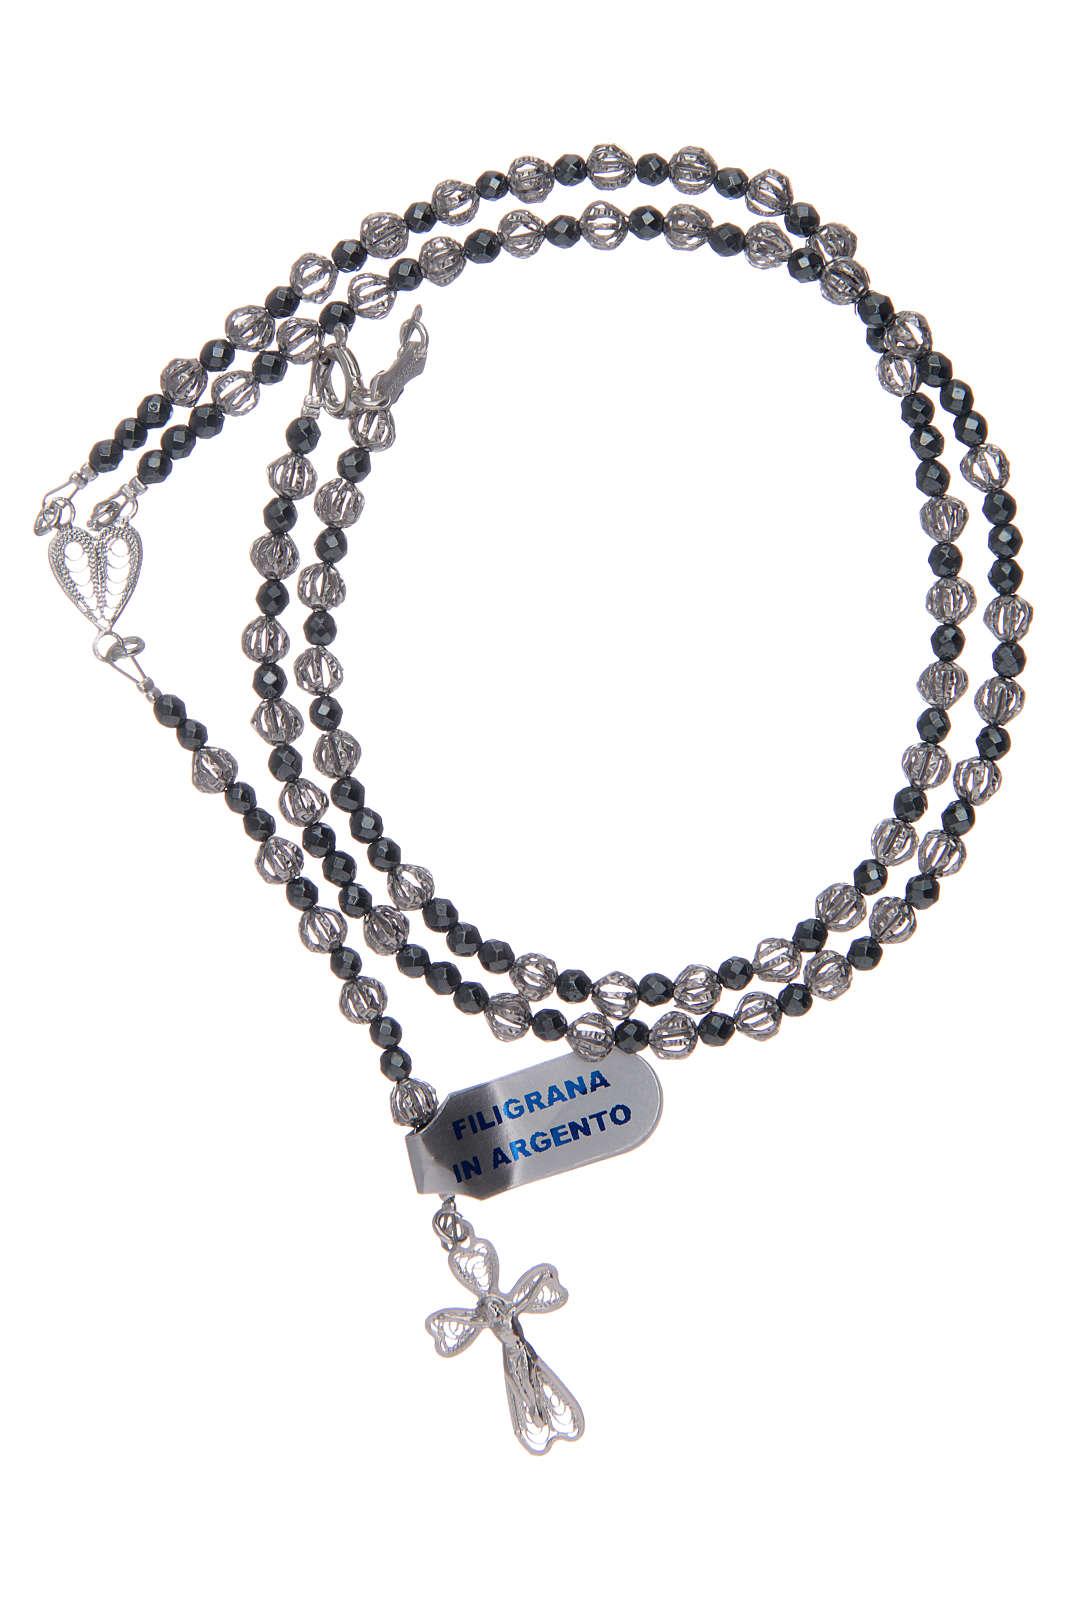 Rosario con filigrana in argento 800 4